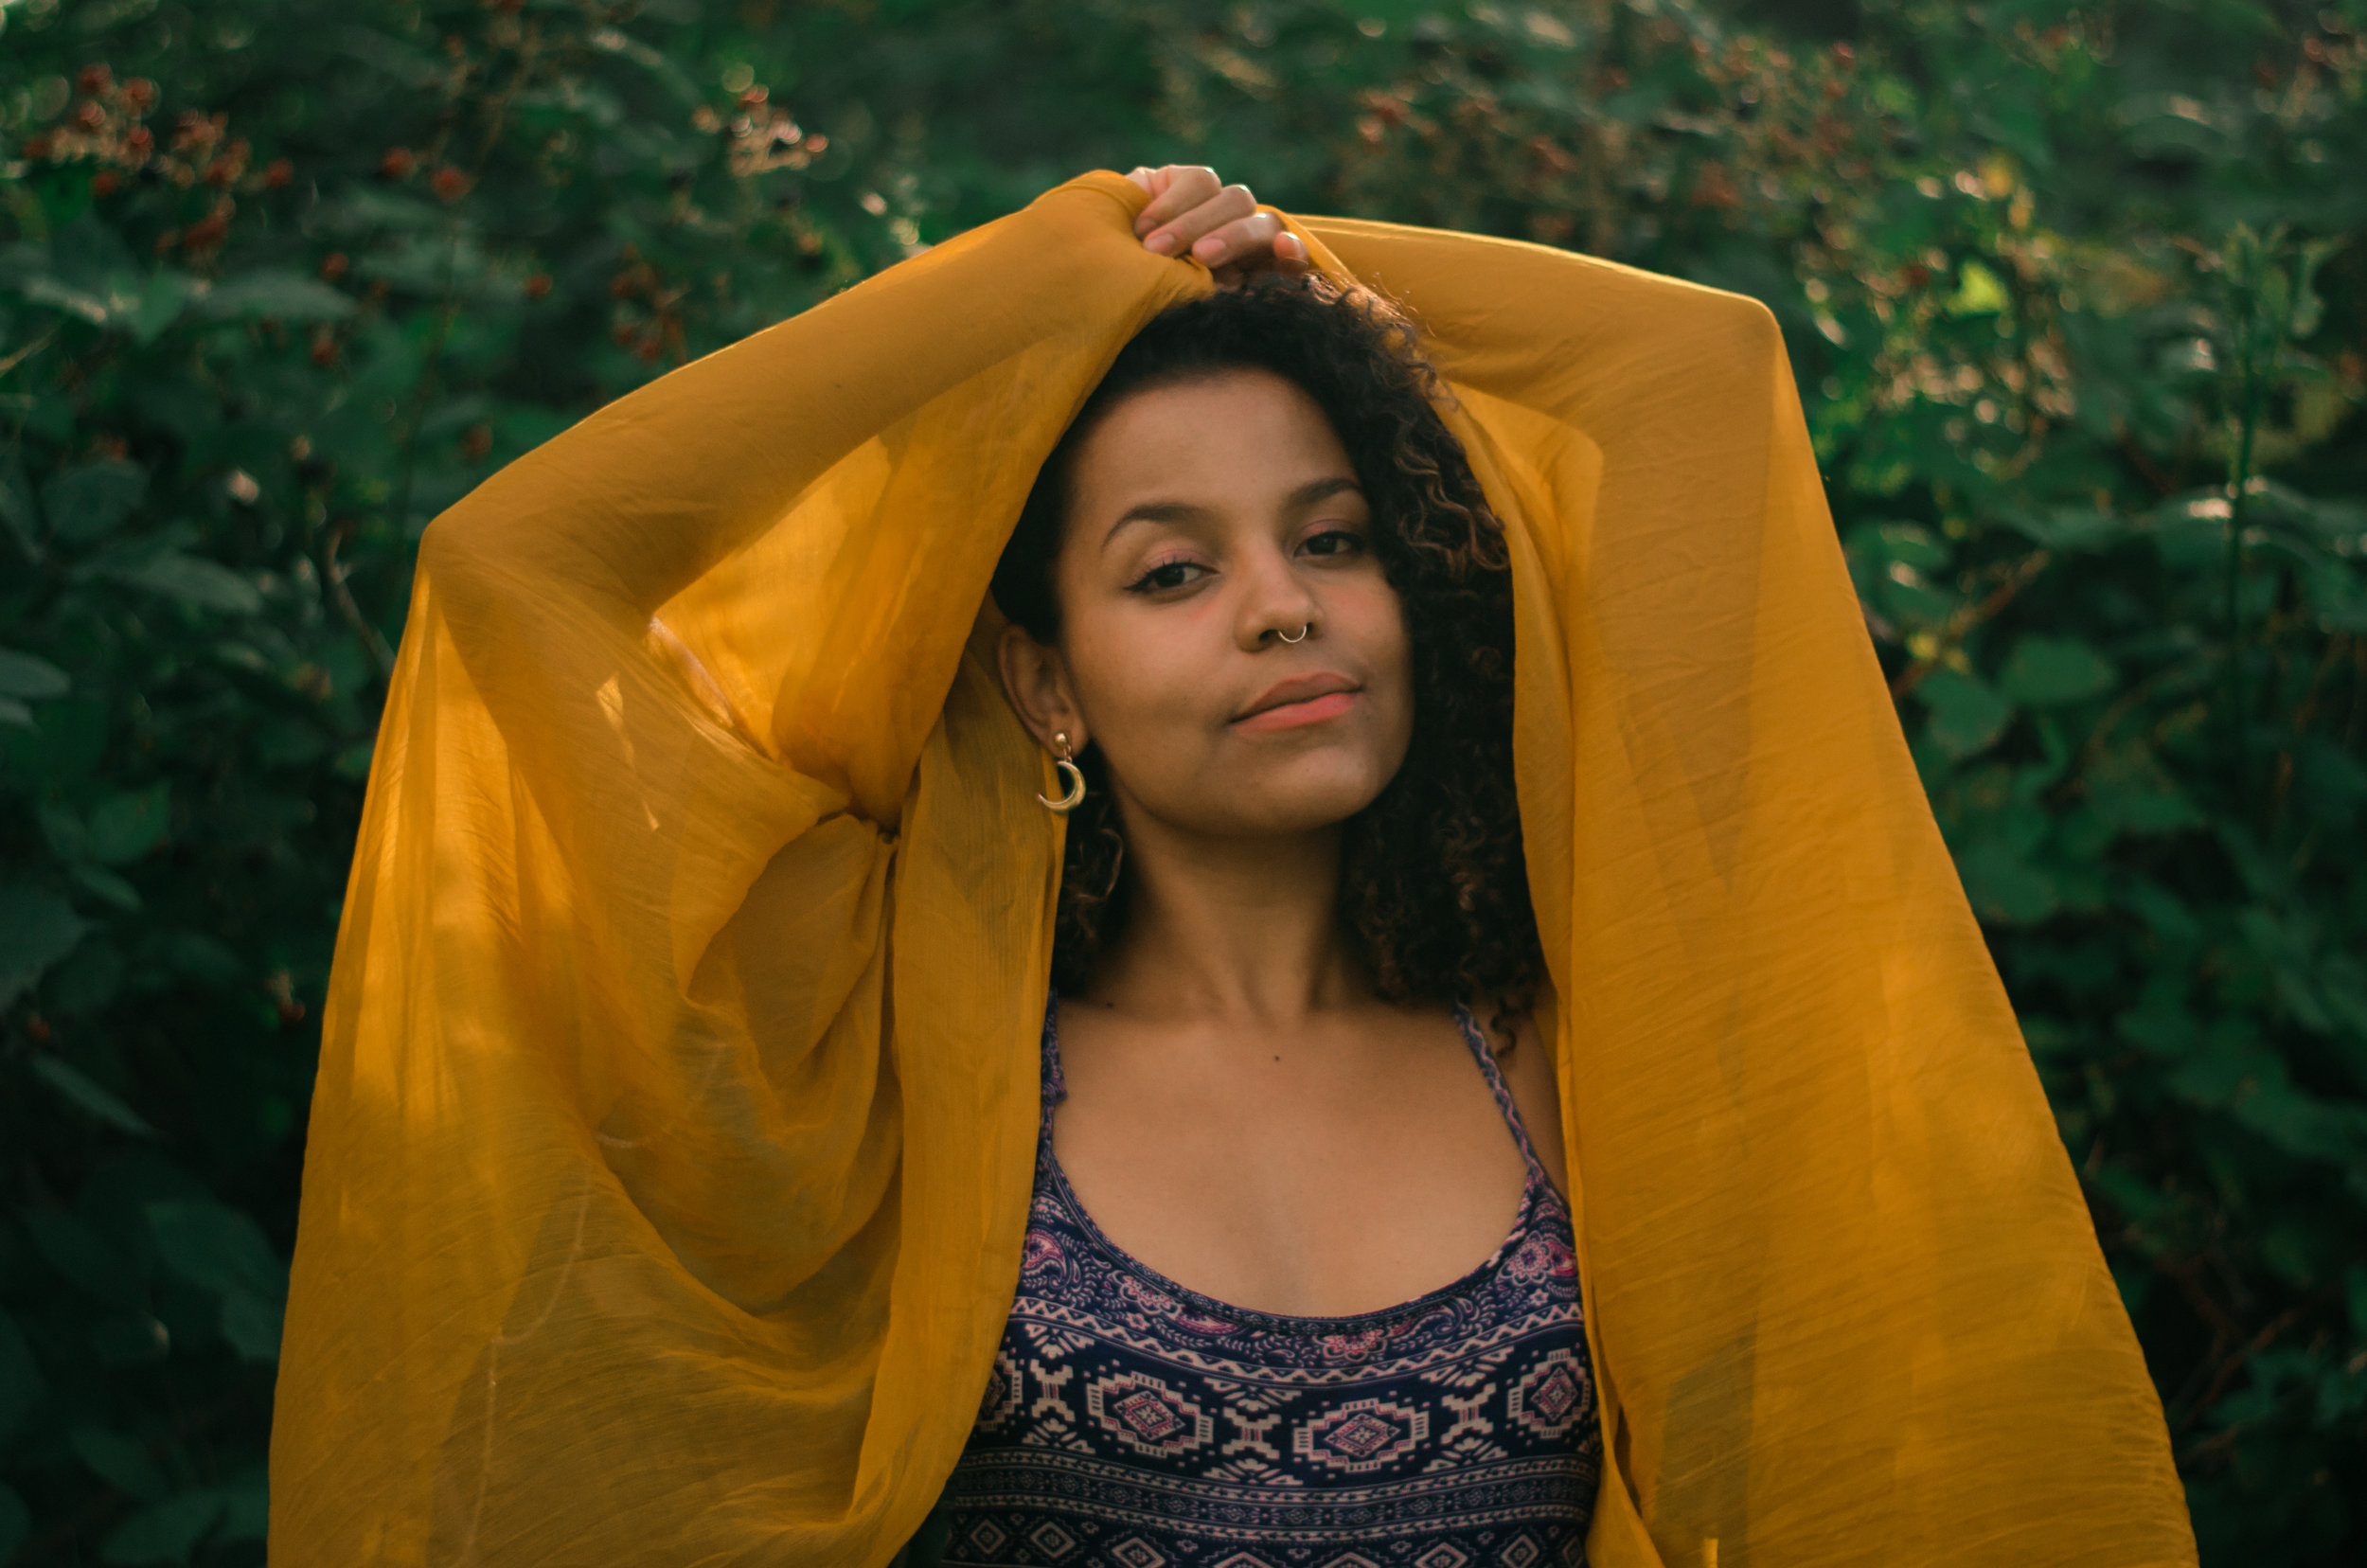 Inka-Portrait-Session-Aiste-Saulyte-Photography-17-07-30-58.jpg